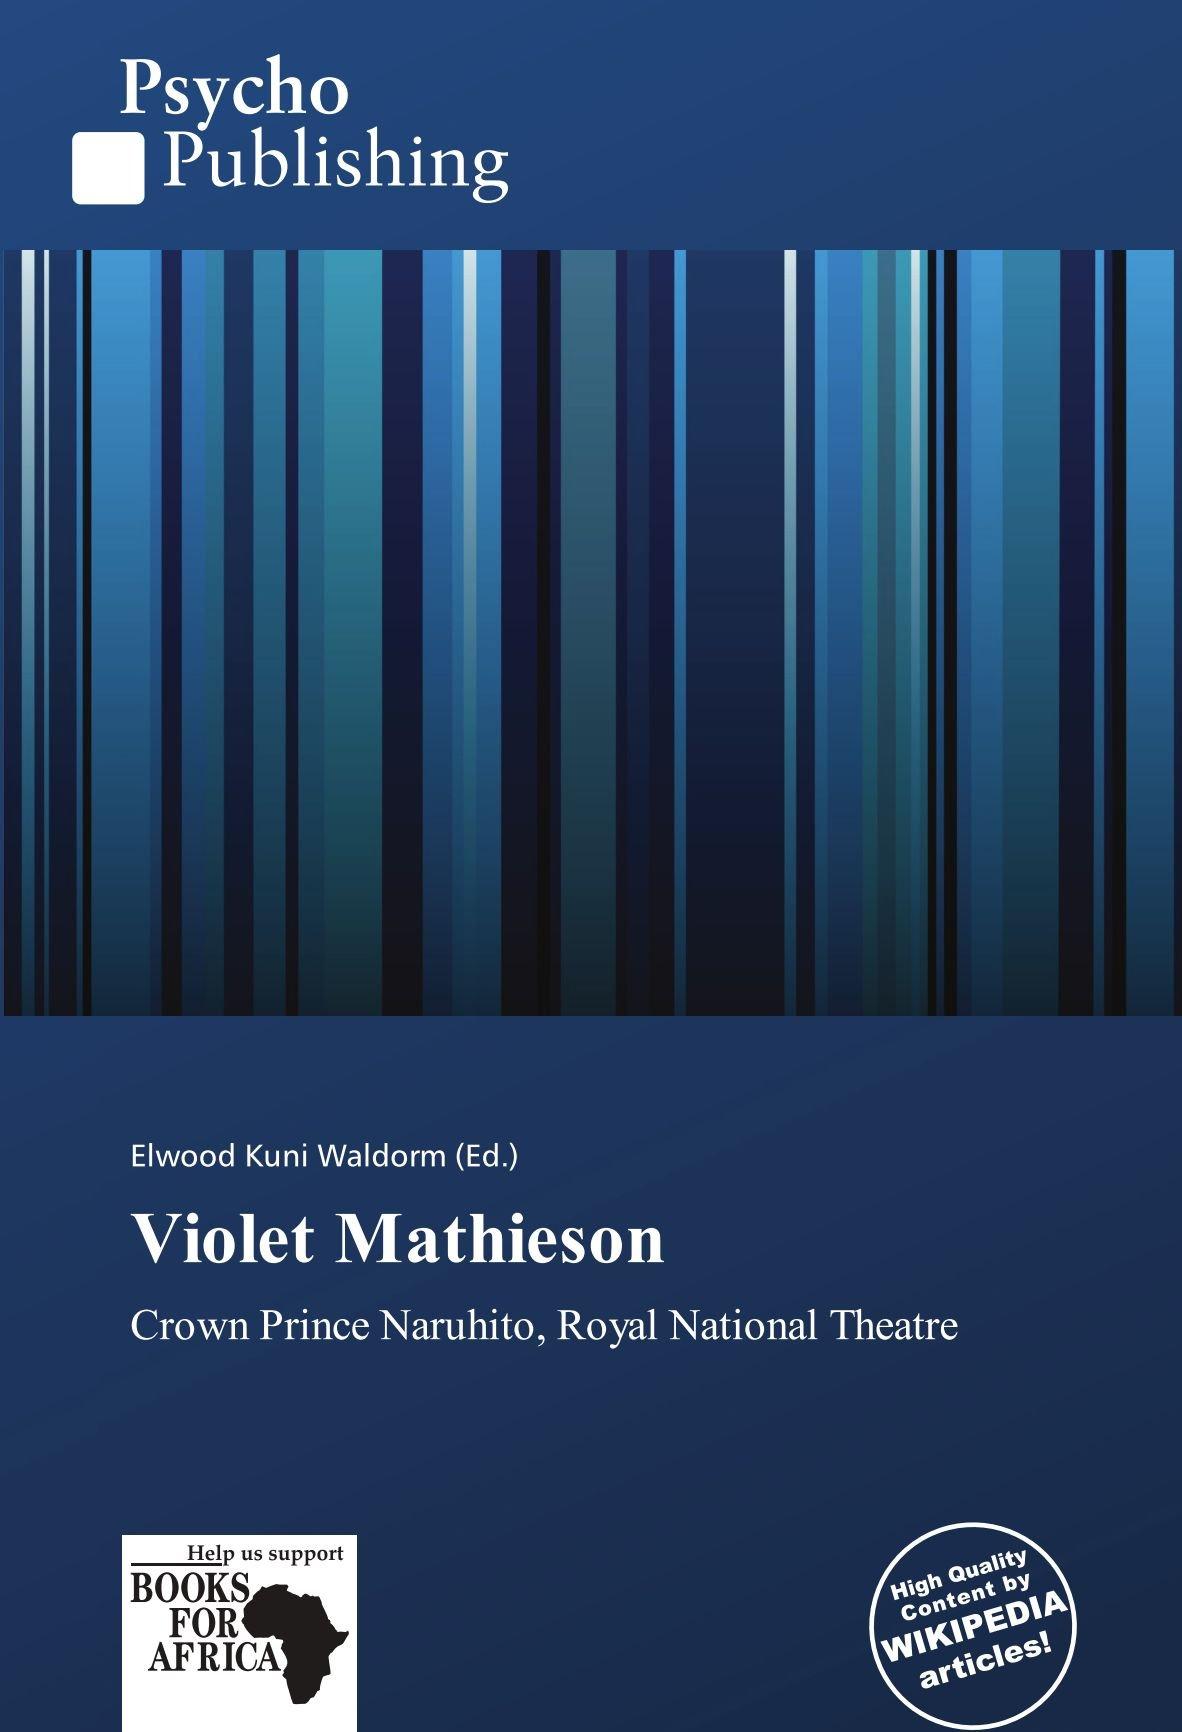 Violet Mathieson